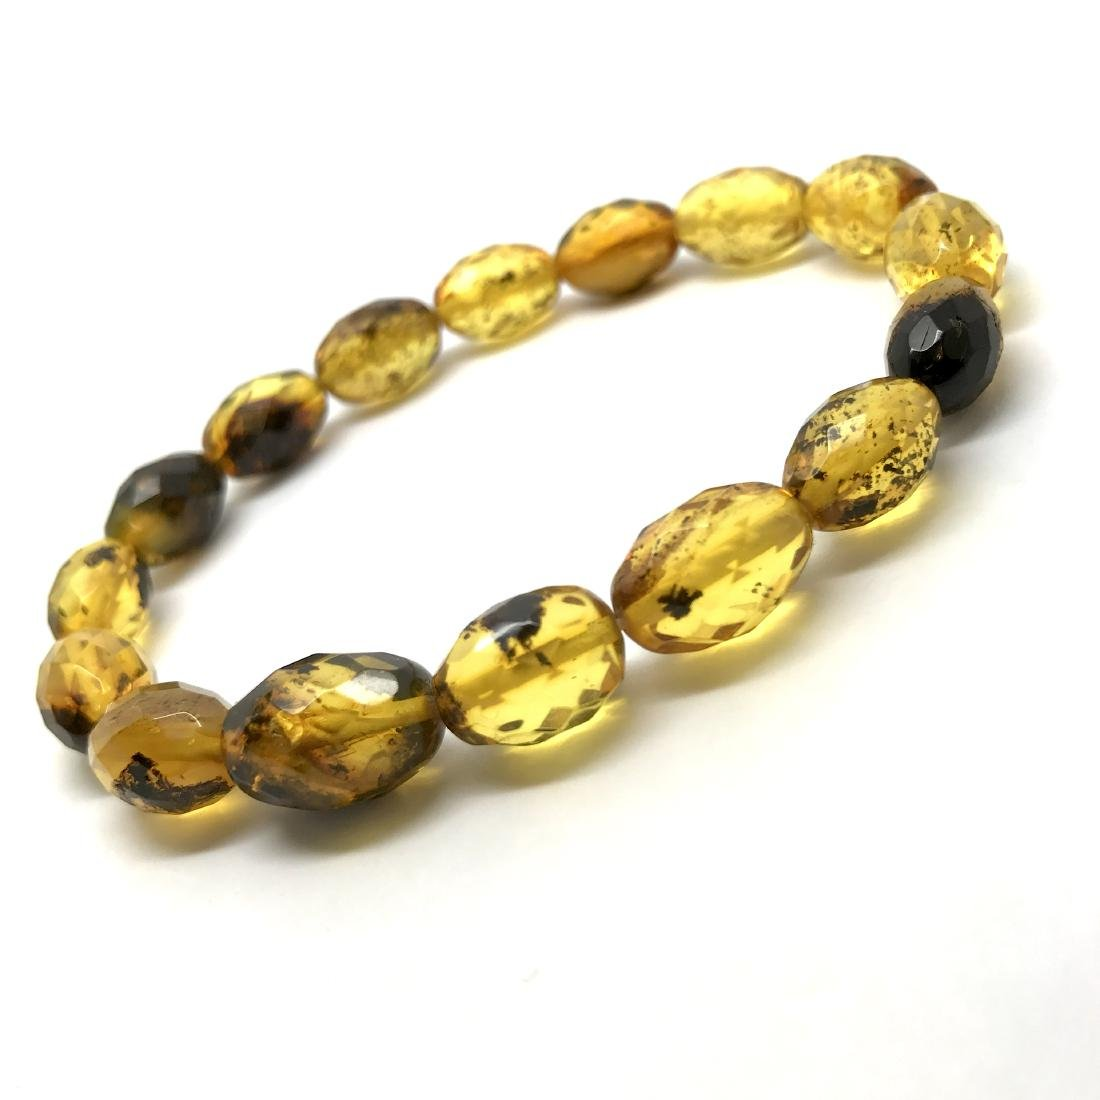 Unique bracelet faceted Baltic amber beads olives honey - 2